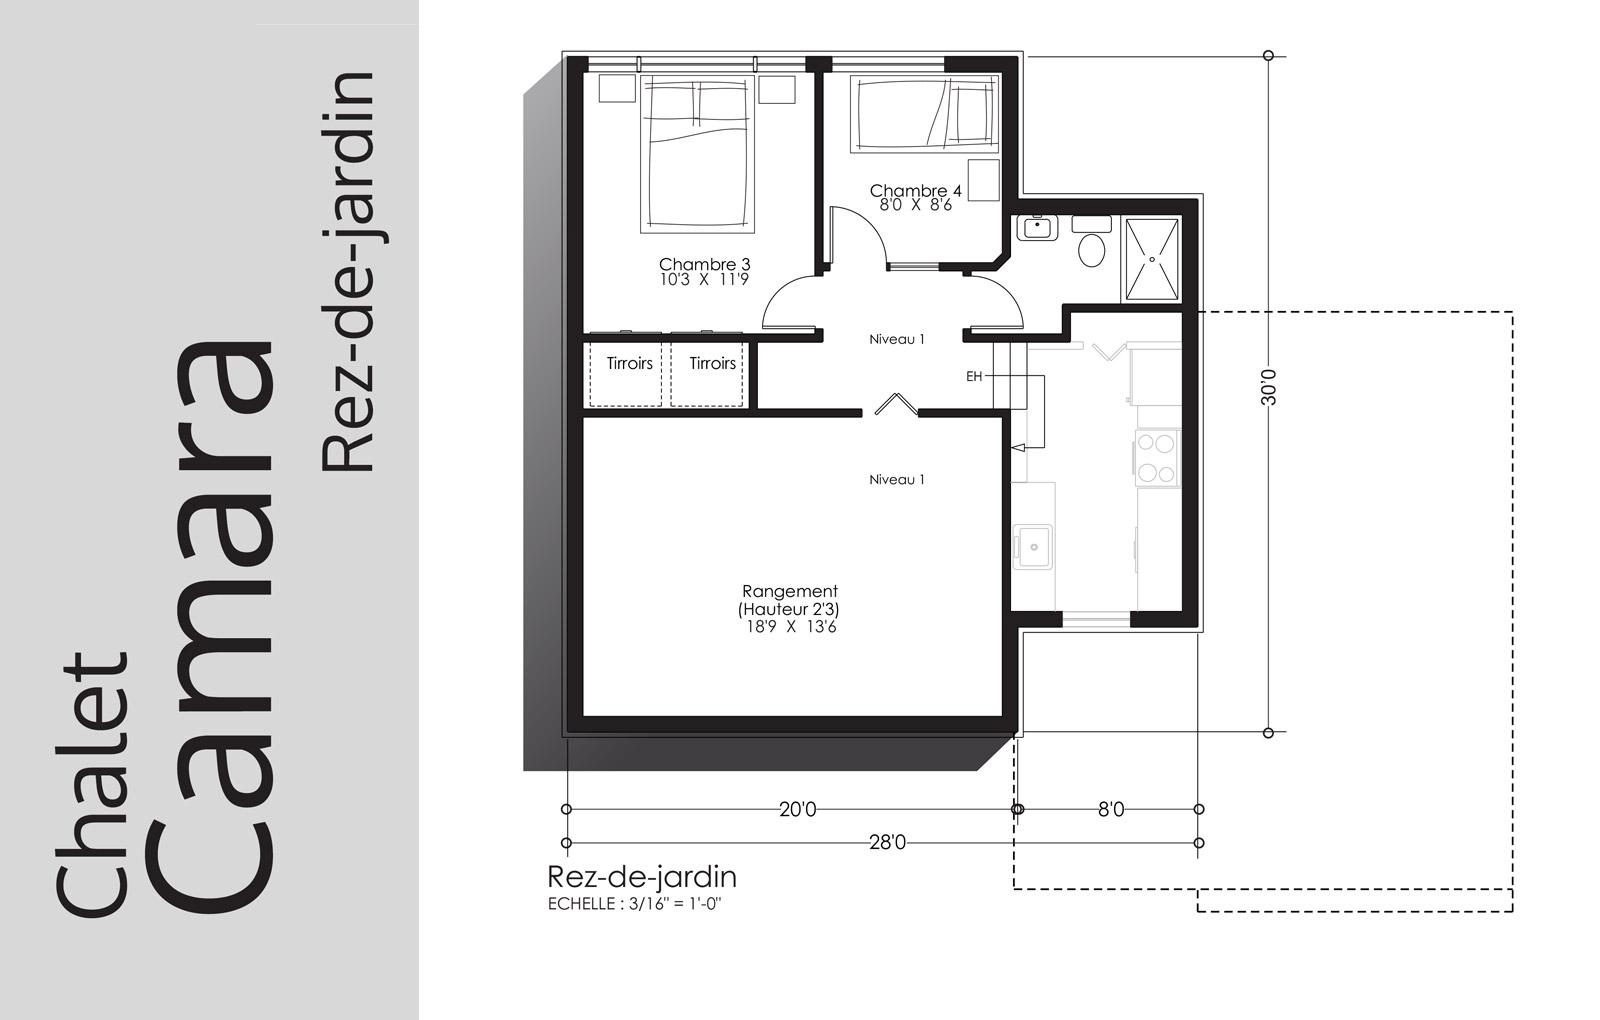 plan Camara - Rez-de-jardin - Domaine Escapad